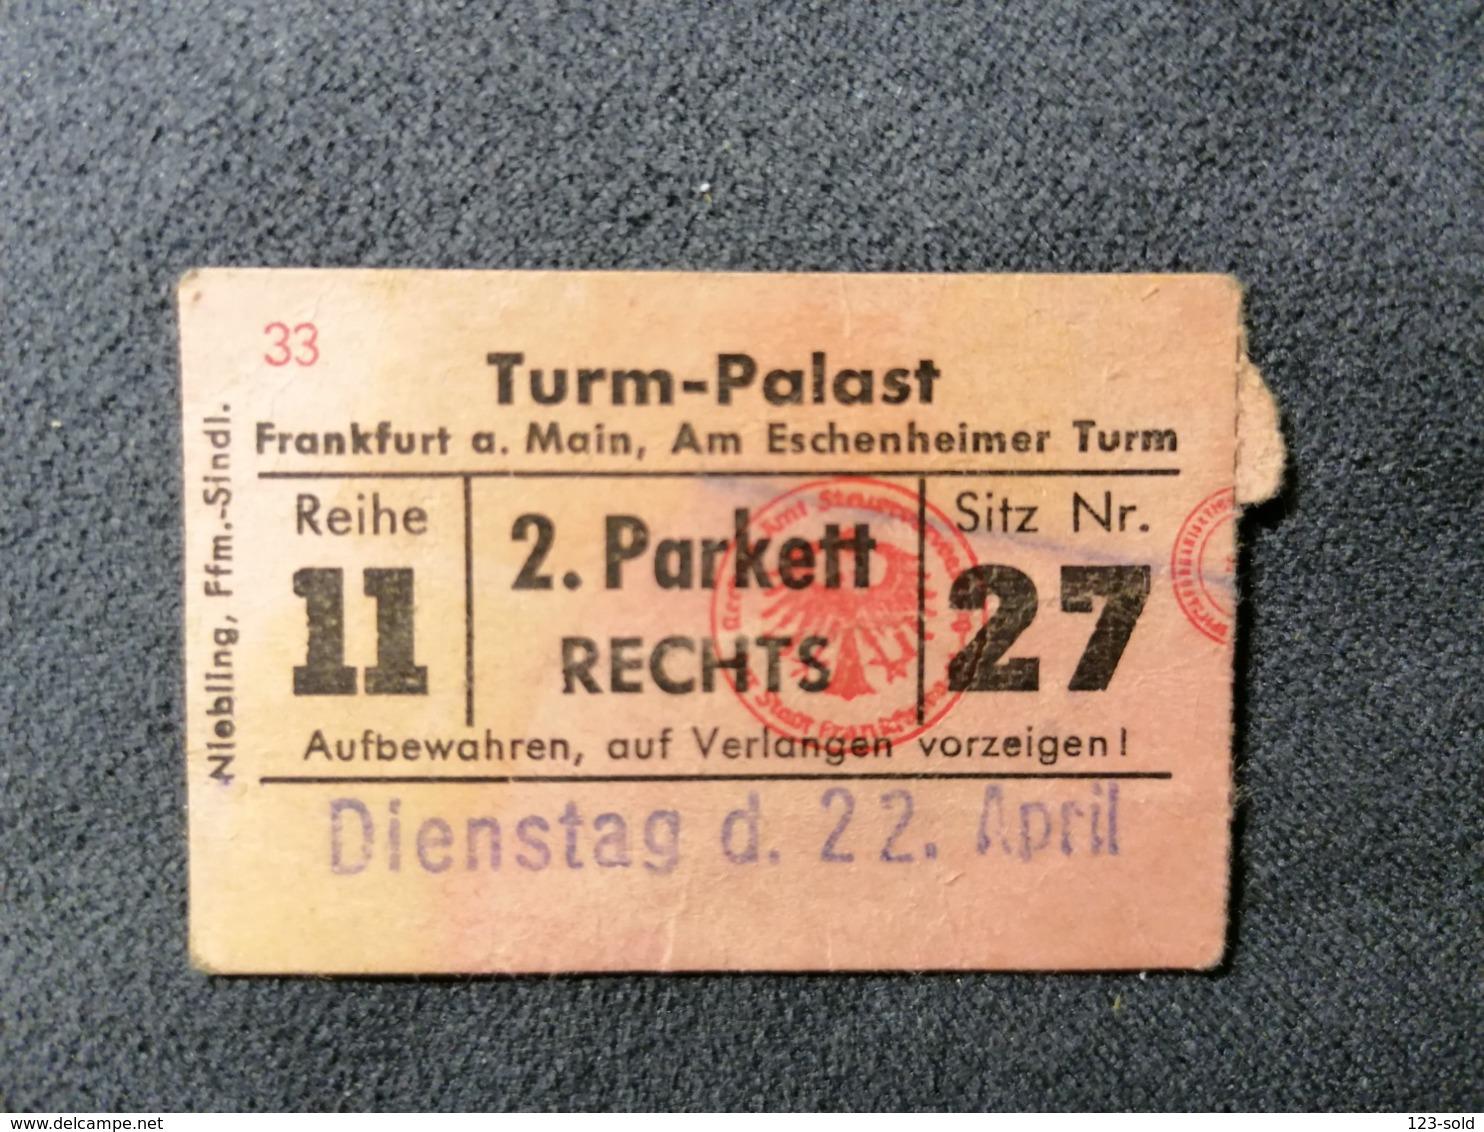 Old Small Ticket TURM PALAST Cinema 1950's / 60's Parket Cinema Kino Frankfurt Am Main Germany - Tickets - Entradas